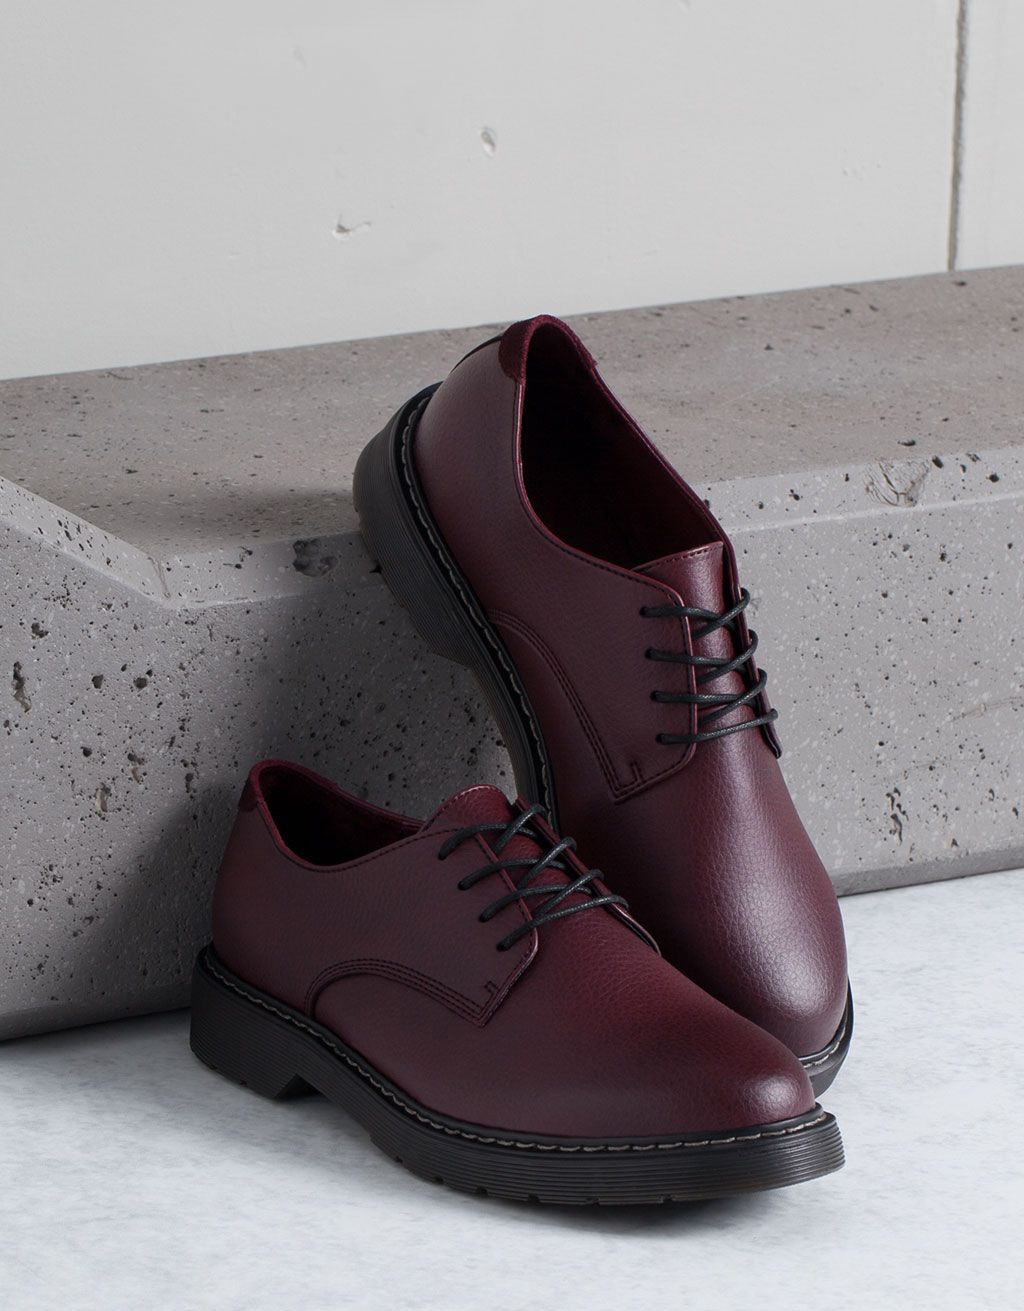 edb44789b5 Men's trim dress shoes in 2019 | Shoes | Dress Shoes, Shoes, Oxford ...